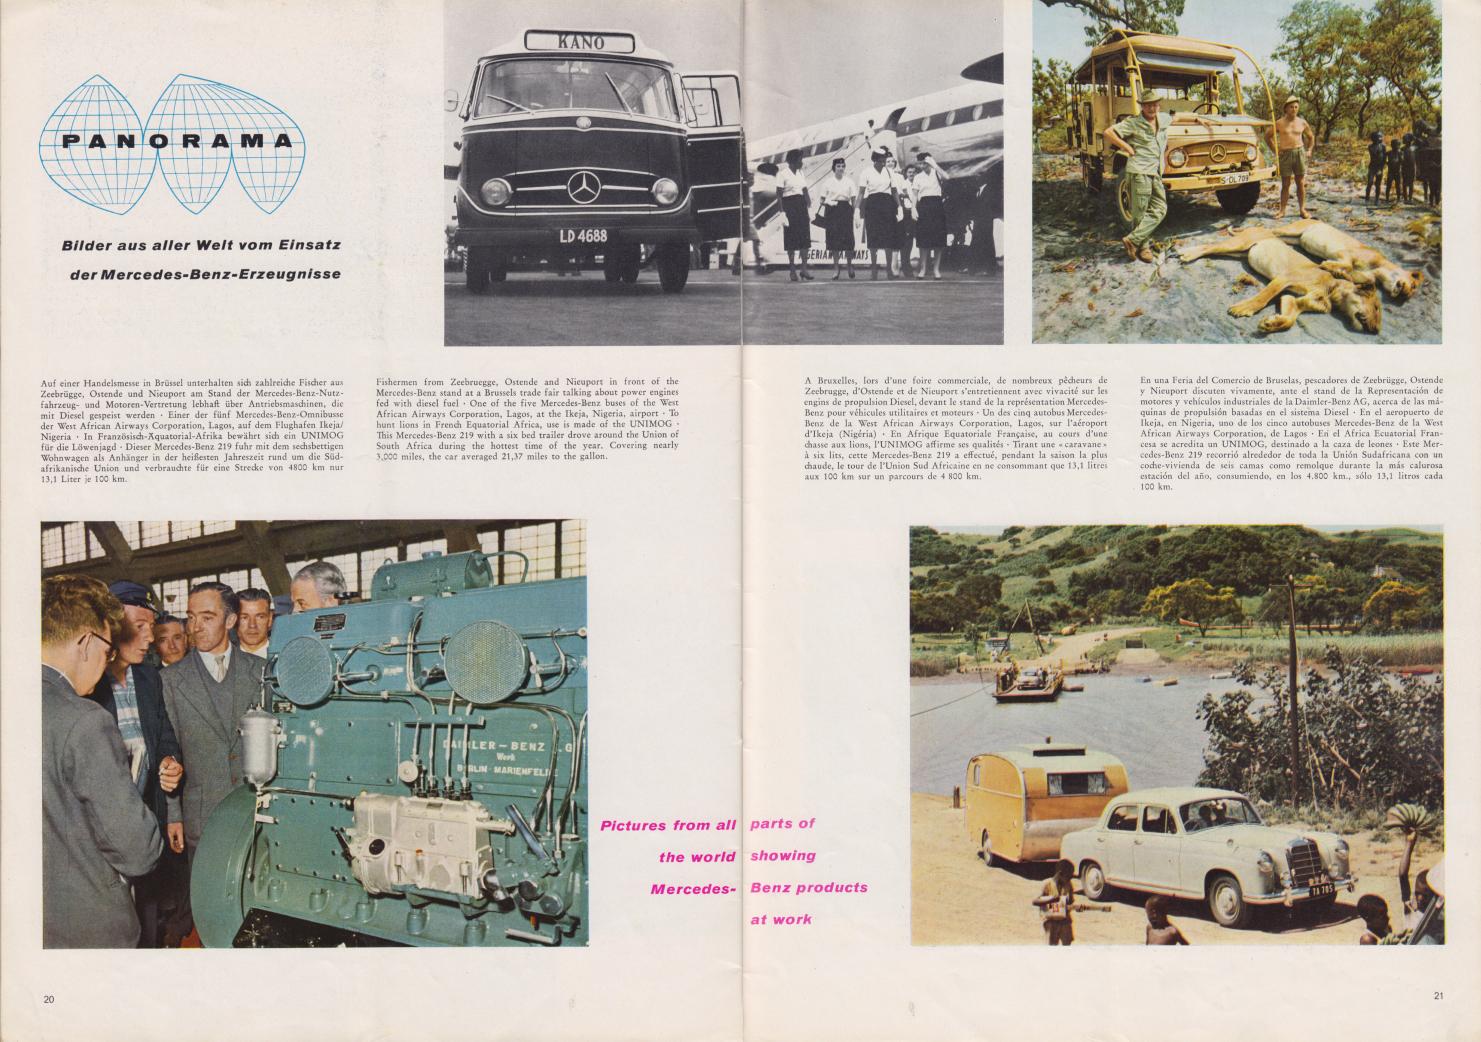 (REVISTA): Periódico In aller welt n.º 37 - Mercedes-Benz no mundo - 1959 - multilingue 011